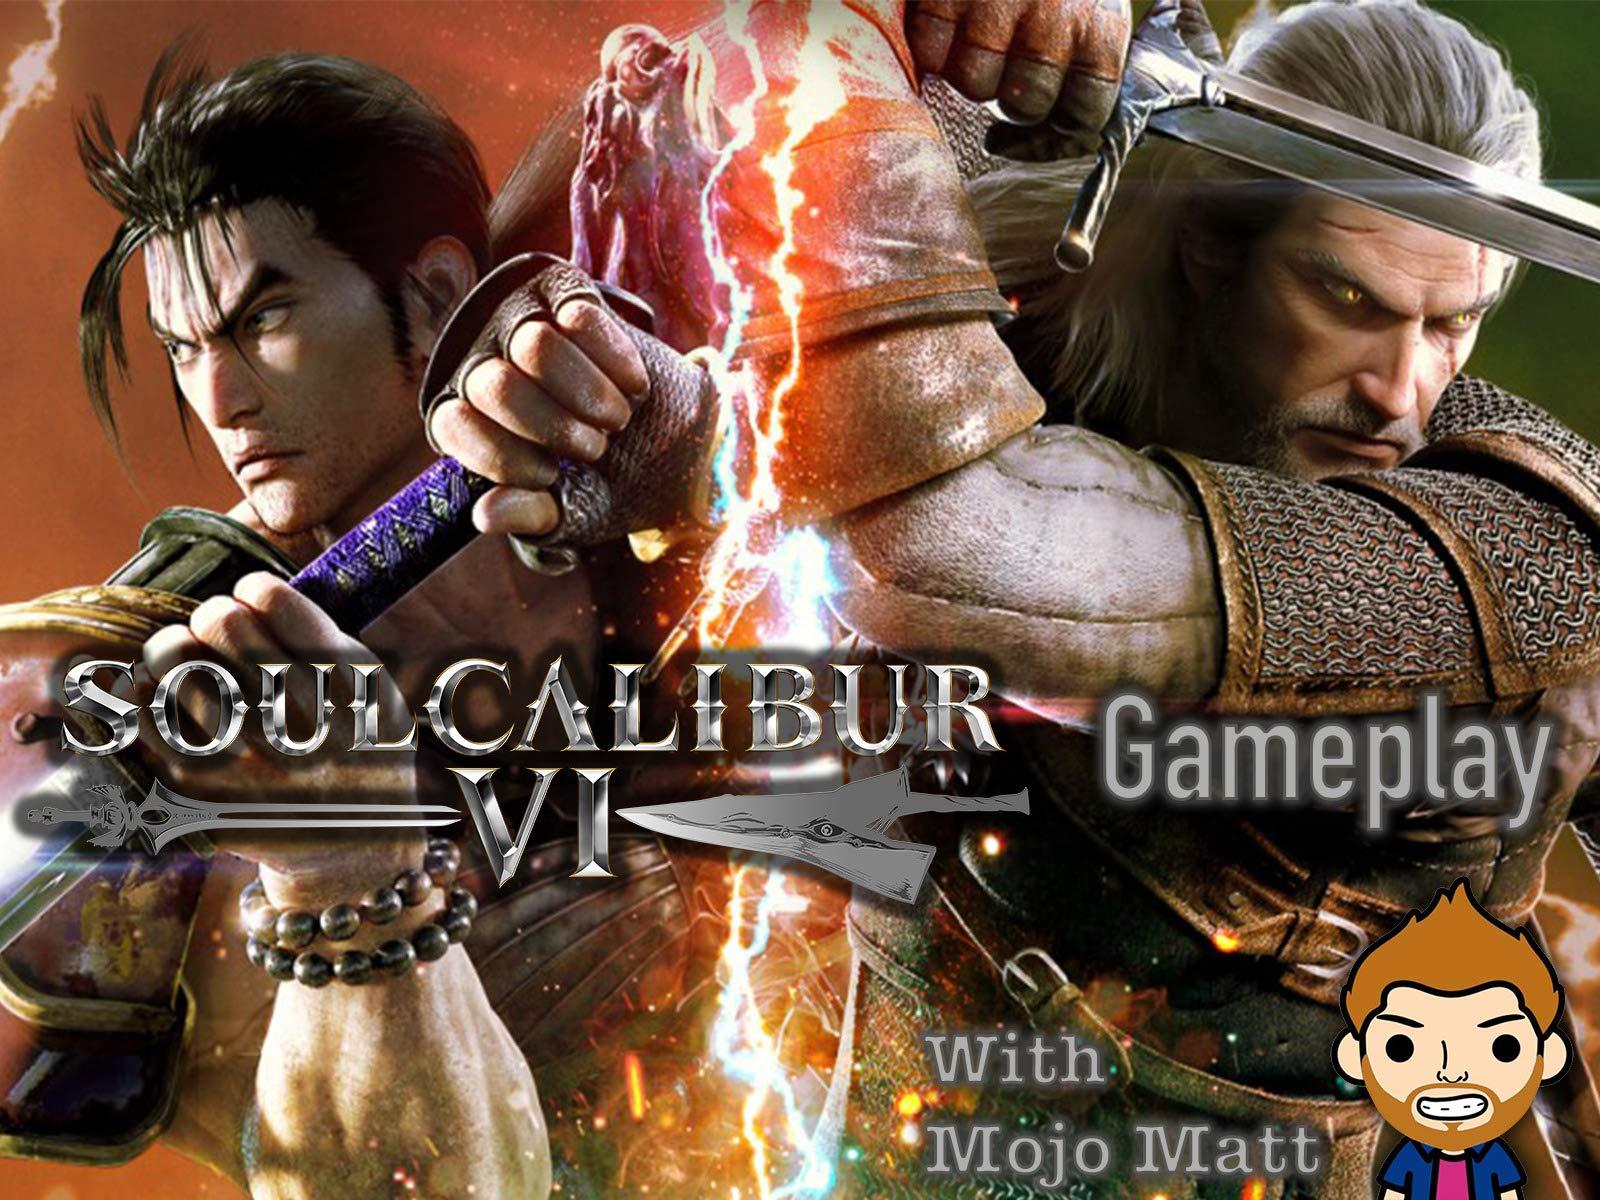 Soul Caliber VI Gameplay With Mojo Matt on Amazon Prime Instant Video UK